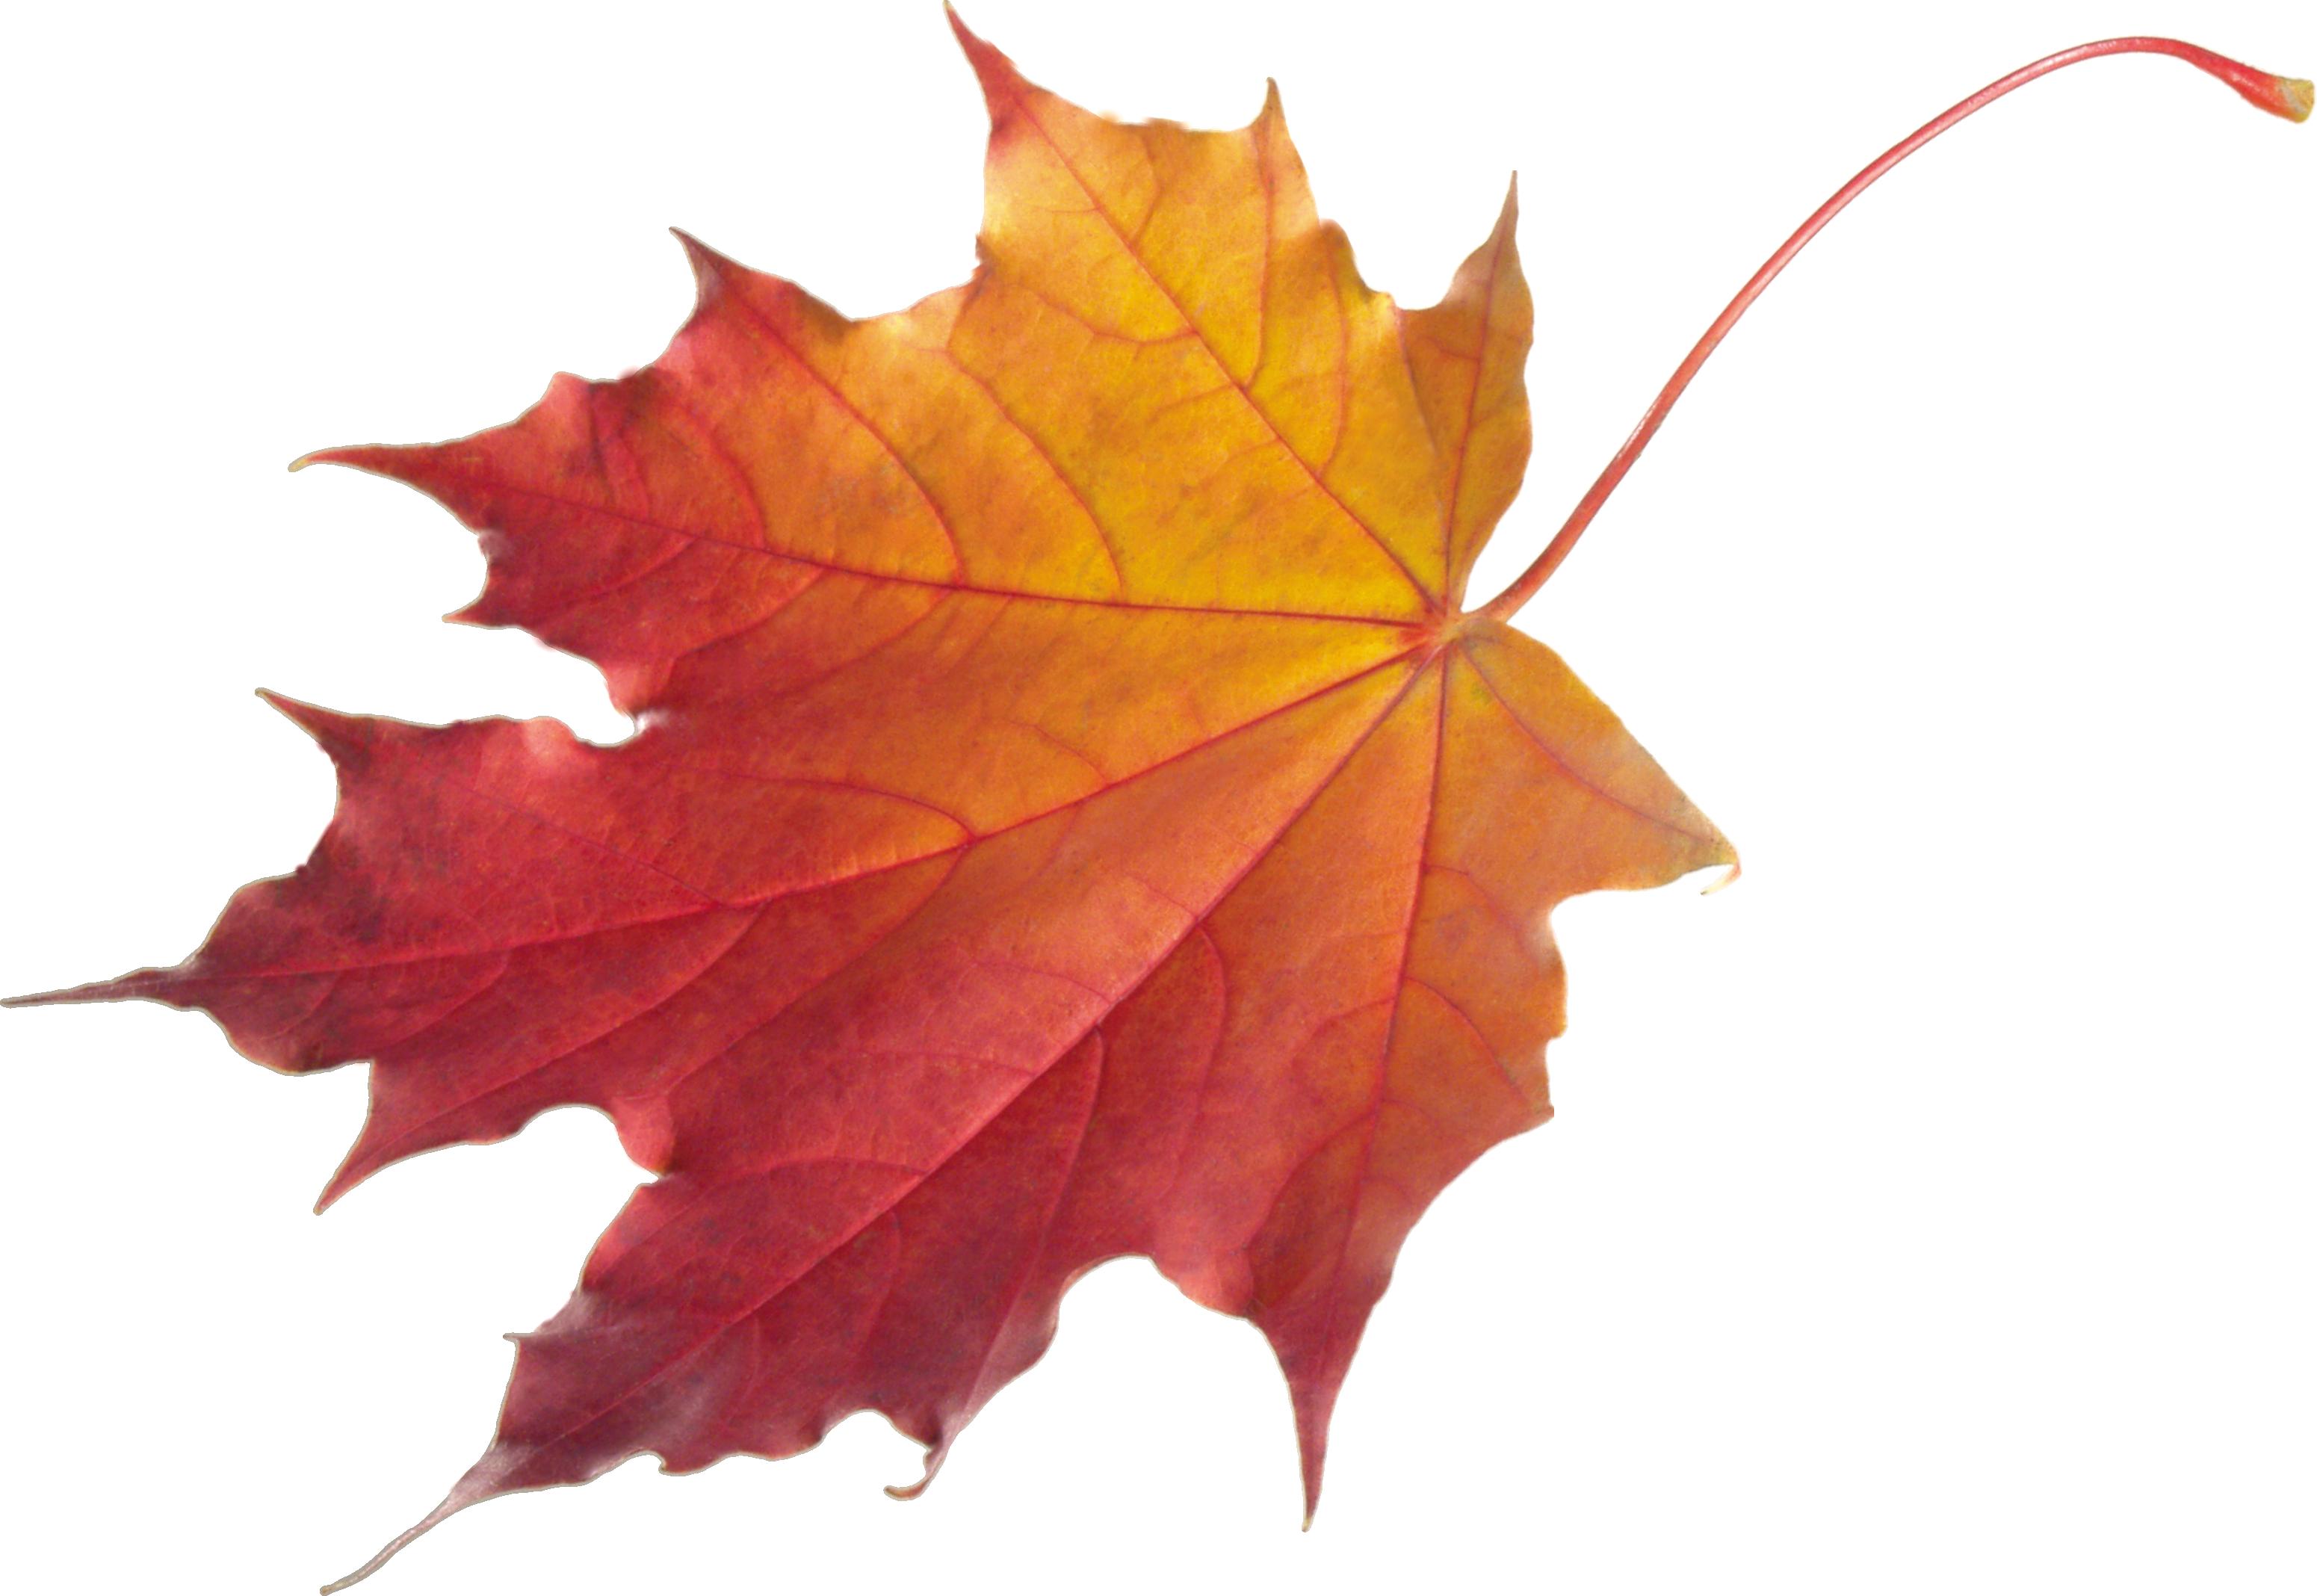 Autumn Leaves Hd Png - Autumn Leaves Hd Png Hdpng.com 3101, Transparent background PNG HD thumbnail